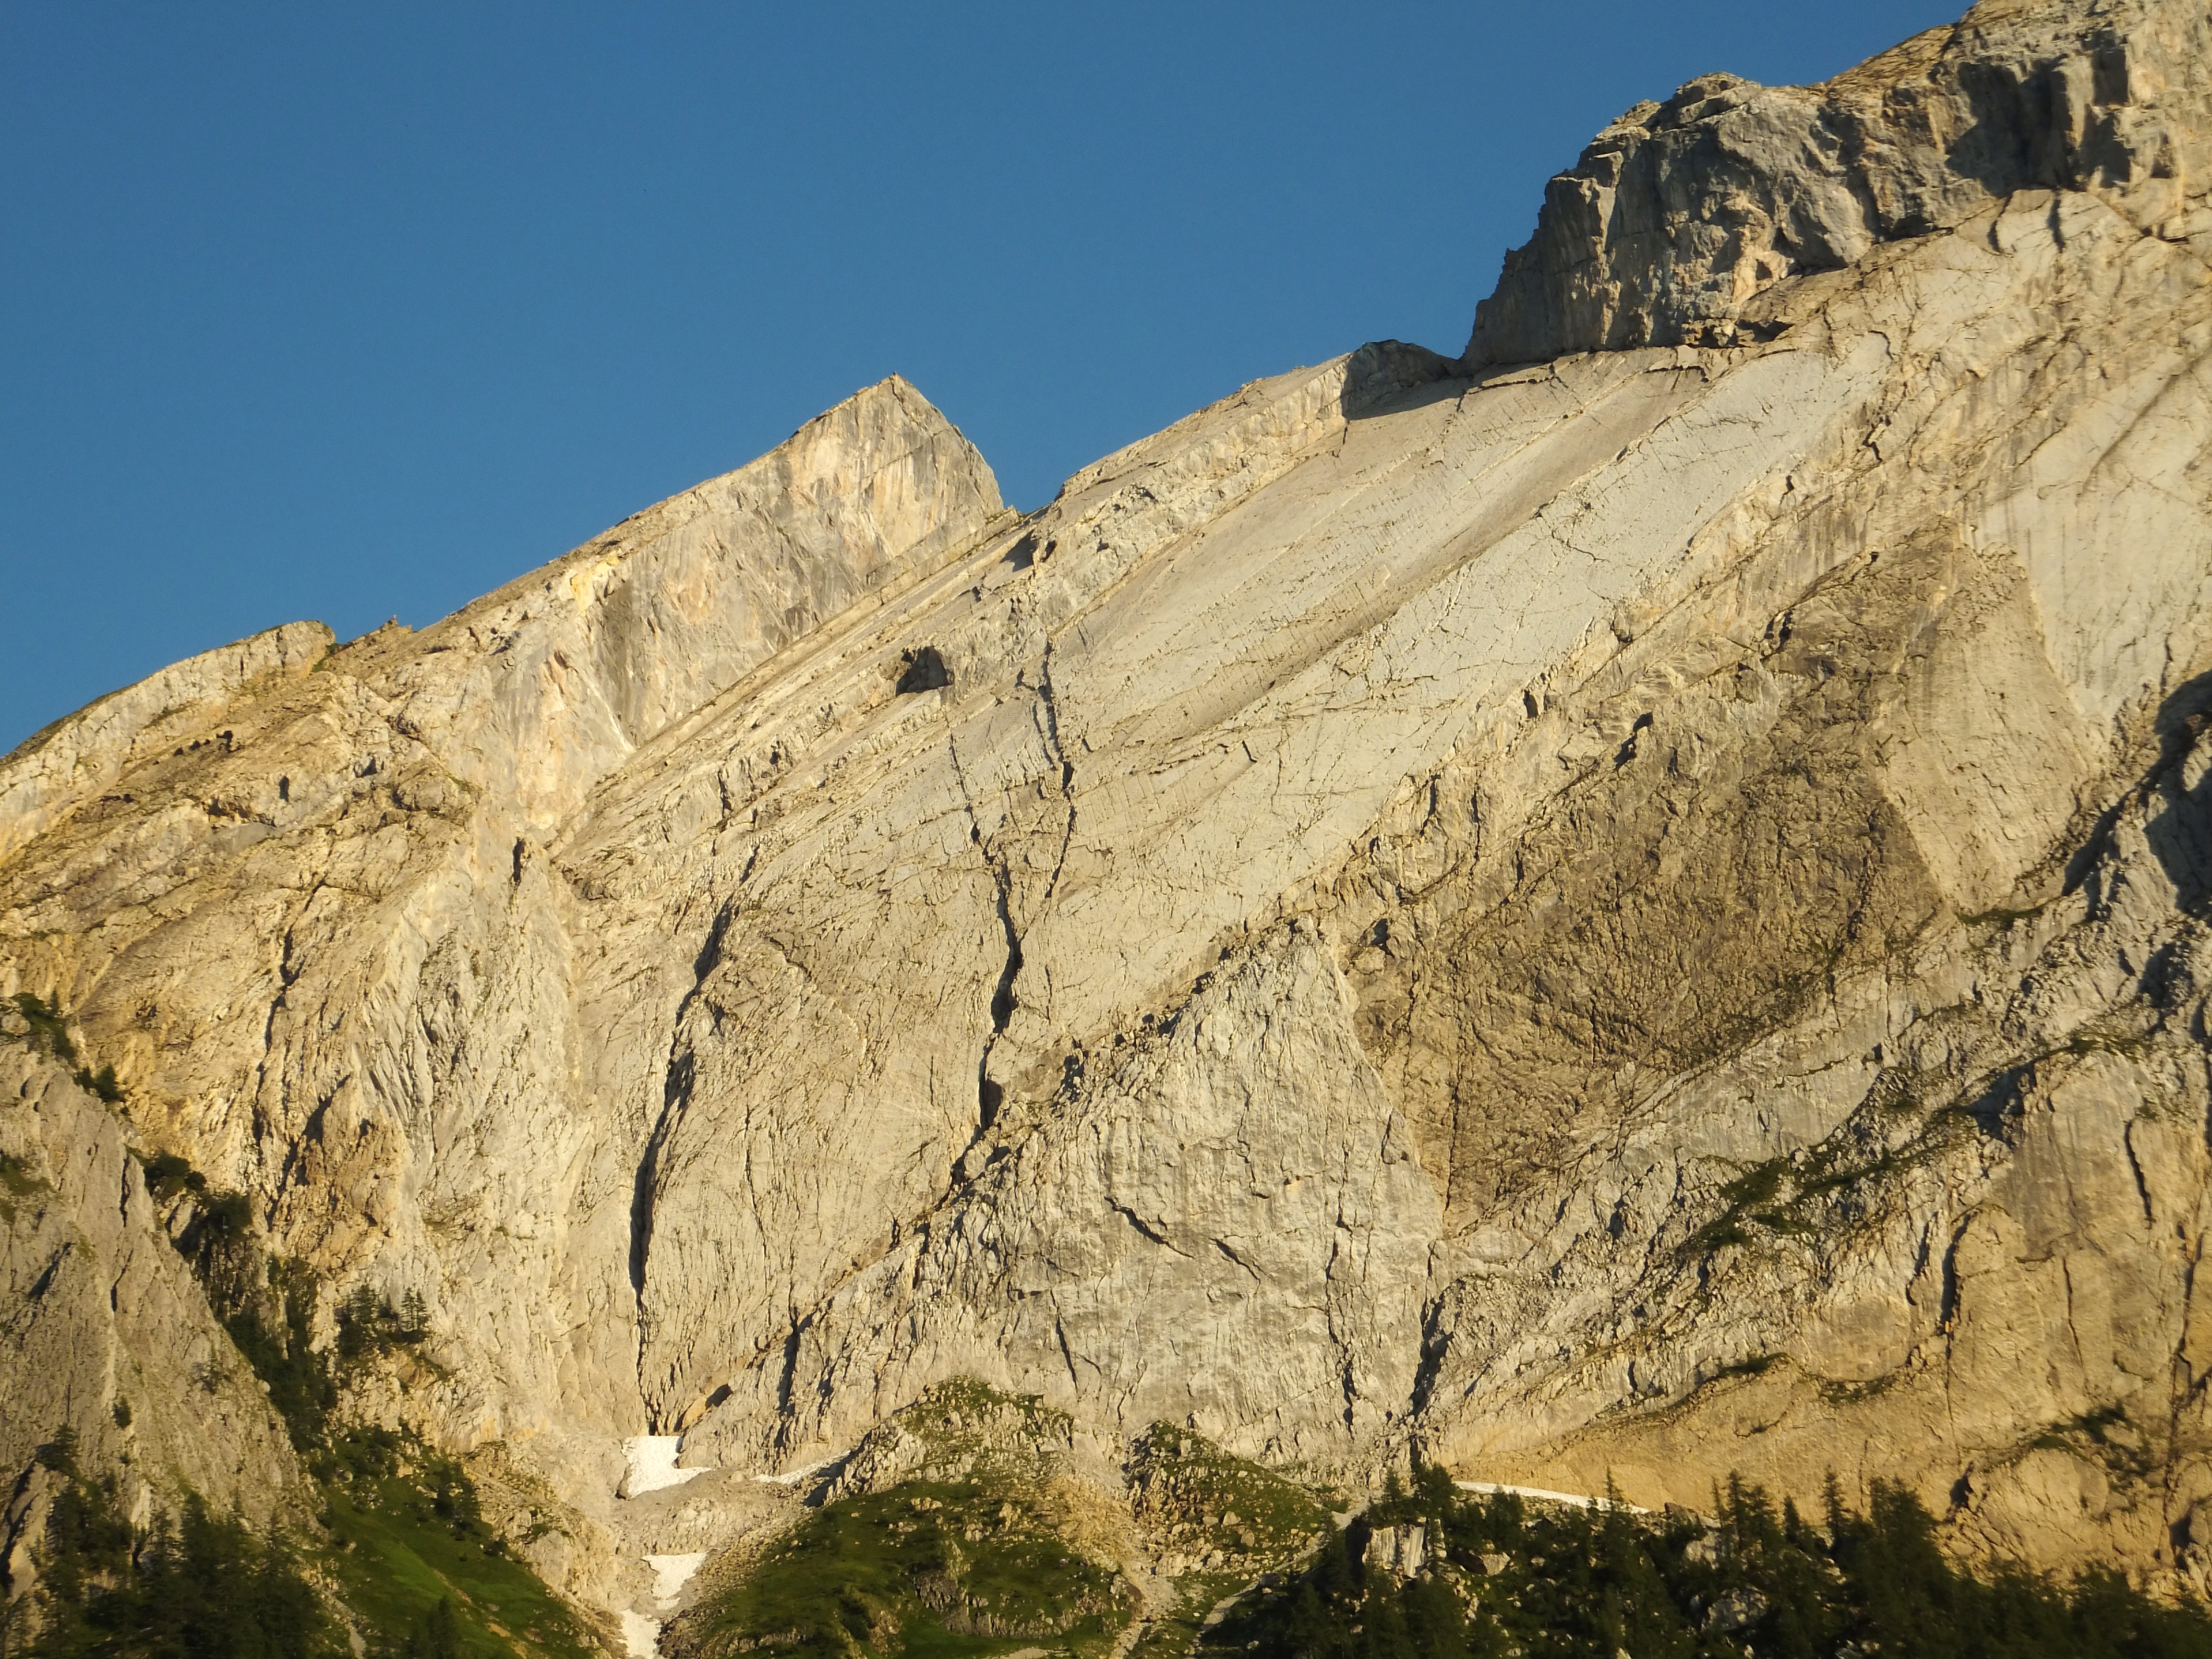 Miroir d argentine alpinistu trebaju brda for Le miroir d argentine